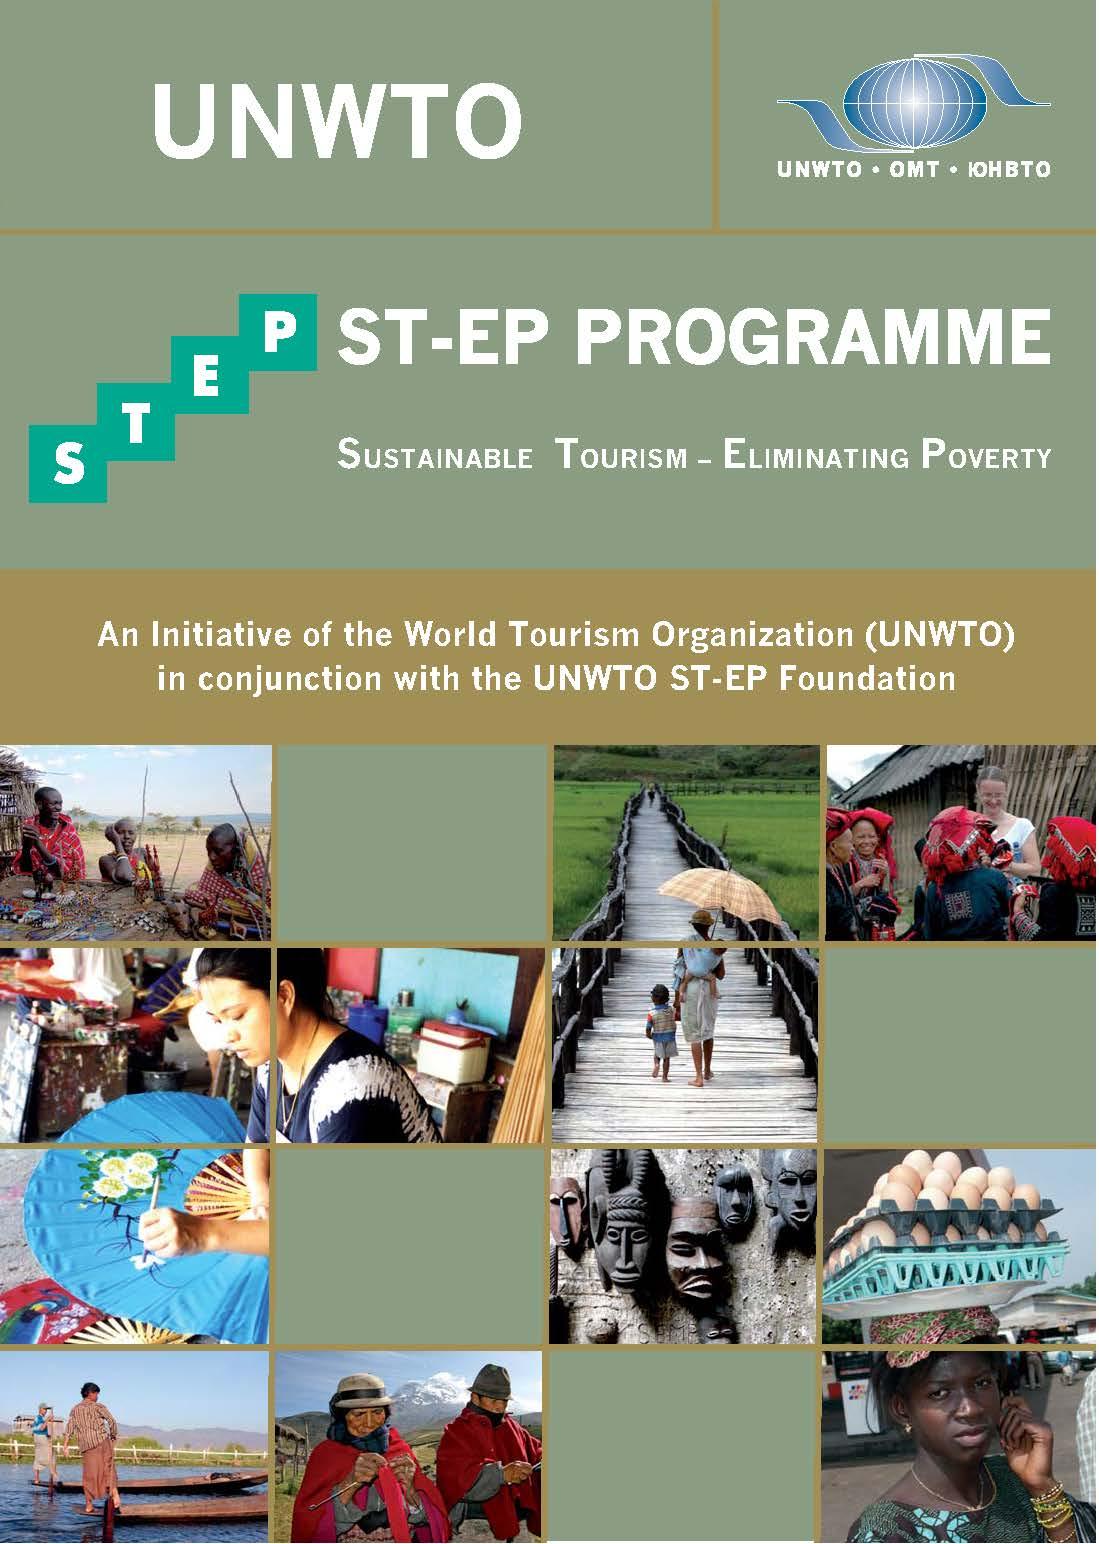 UNWTO ST-EP Programme